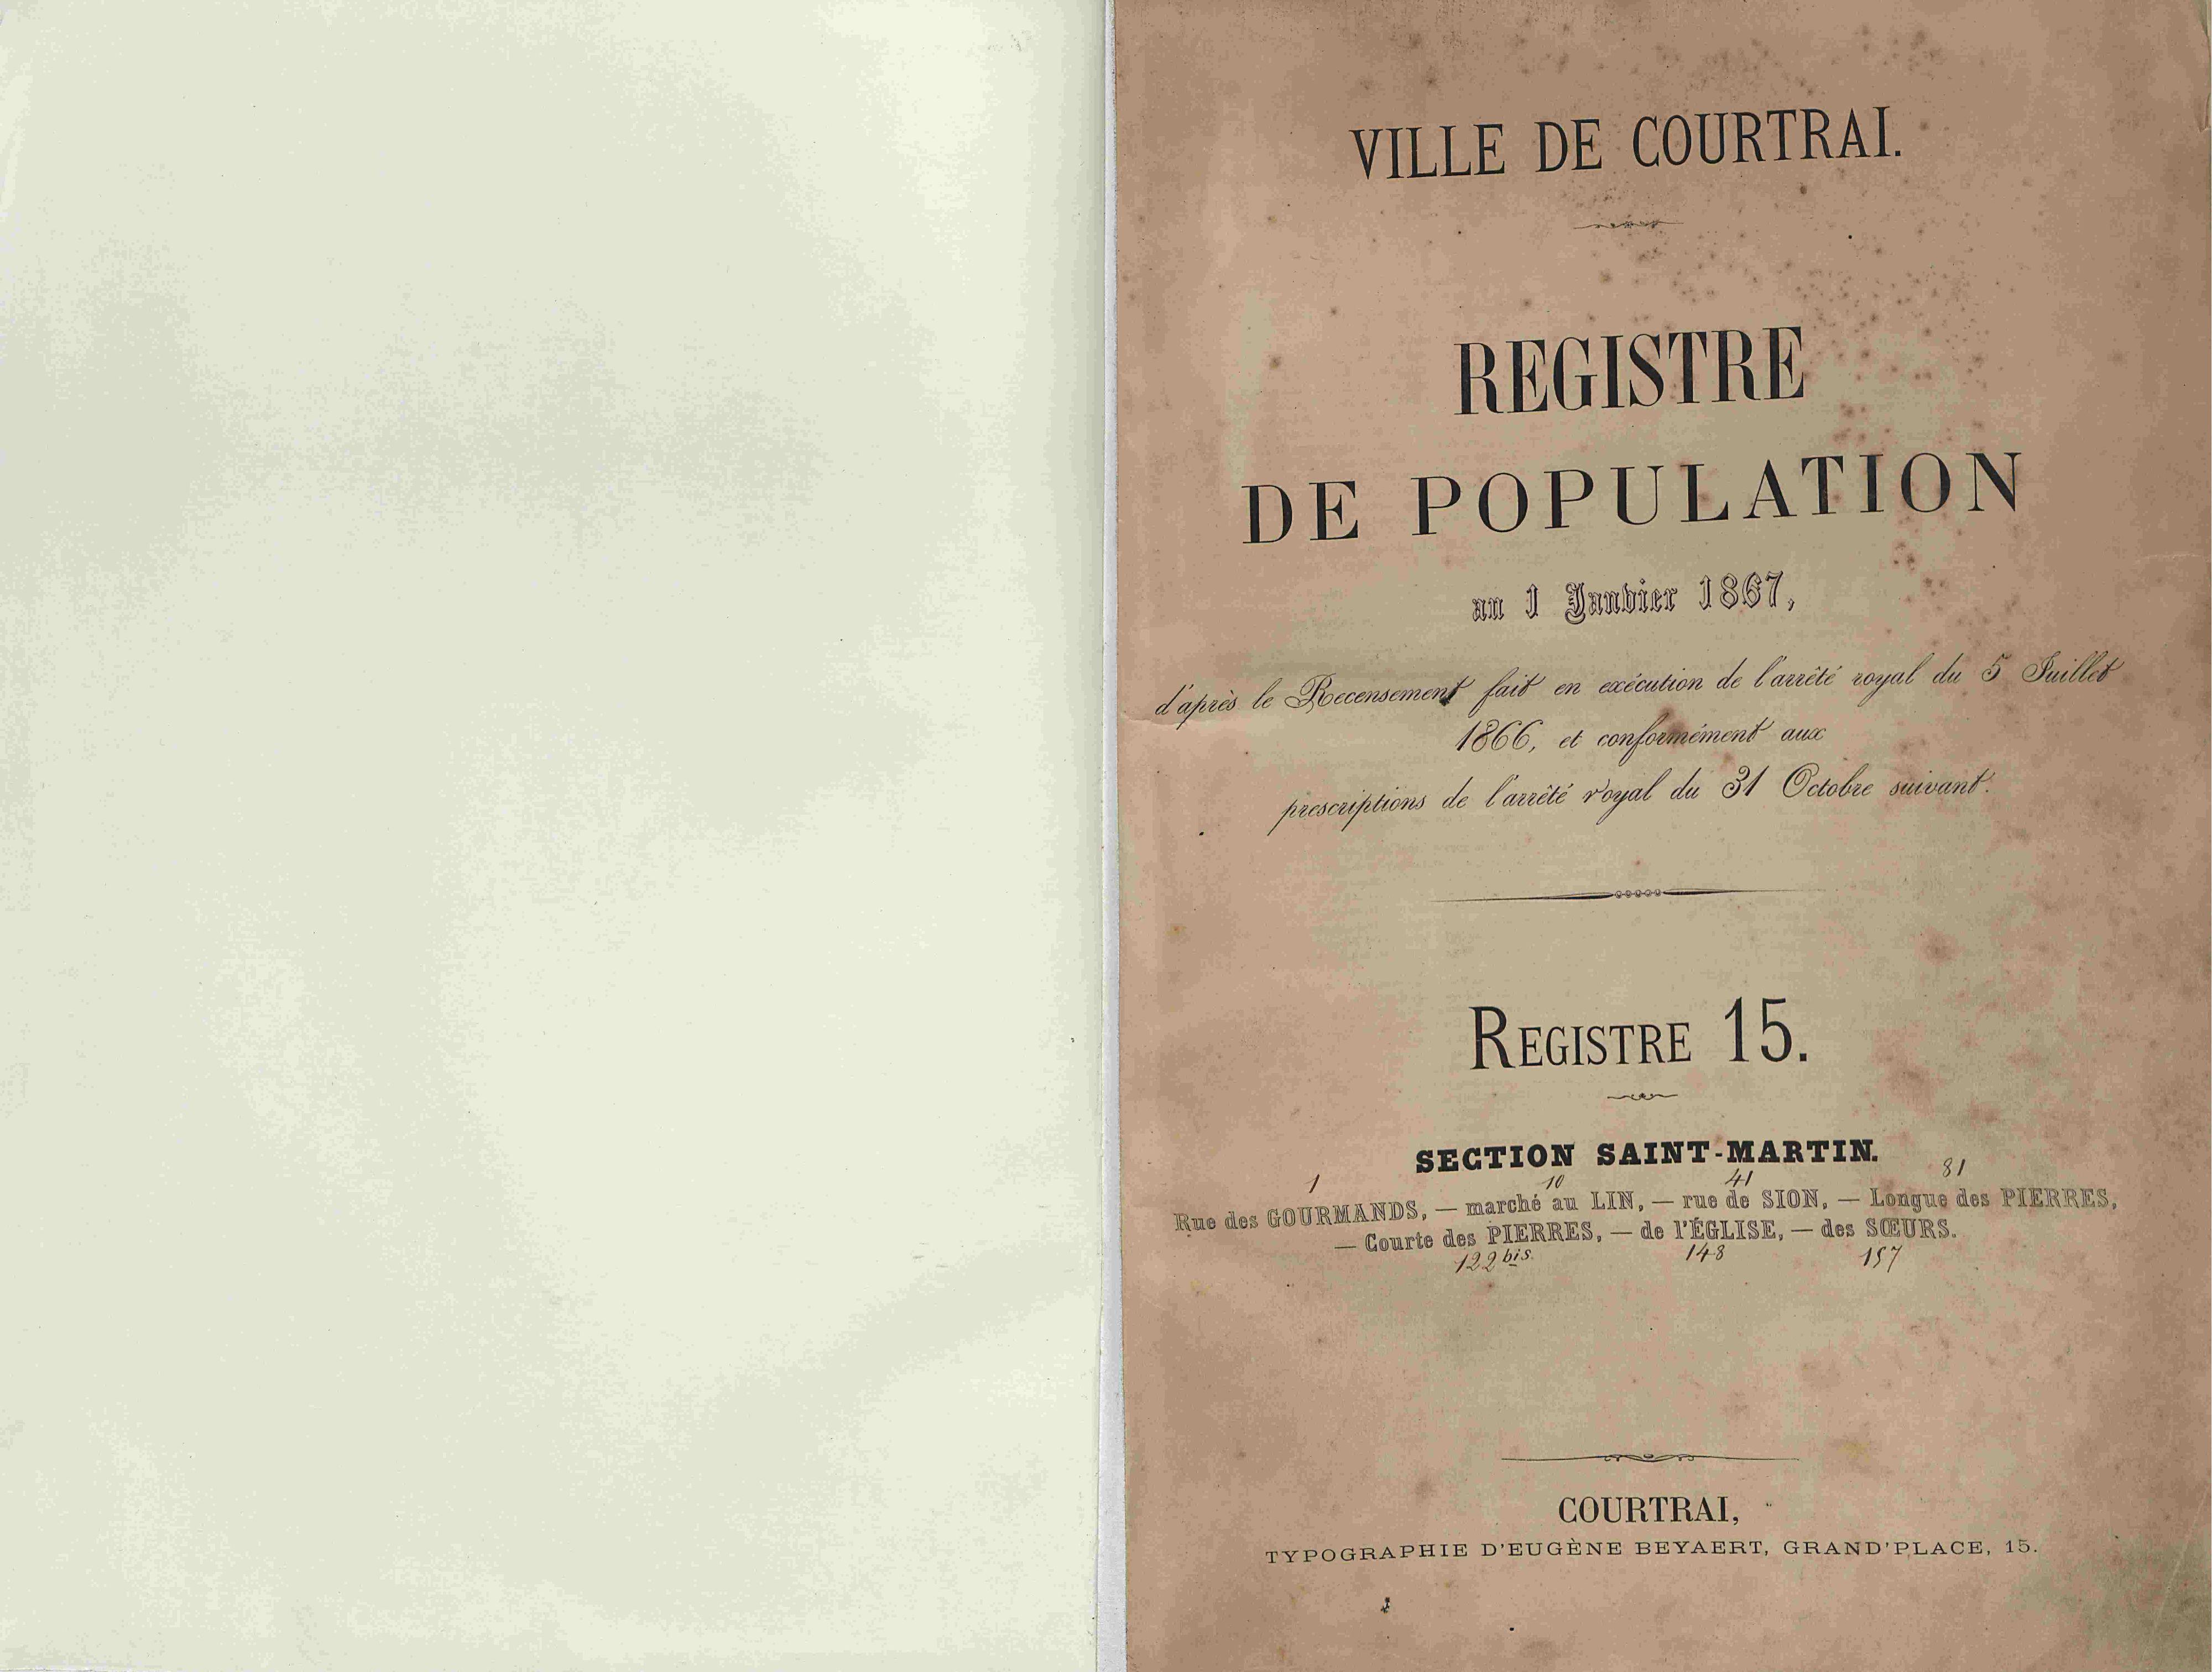 Bevolkingsregister Kortrijk 1866 boek 15